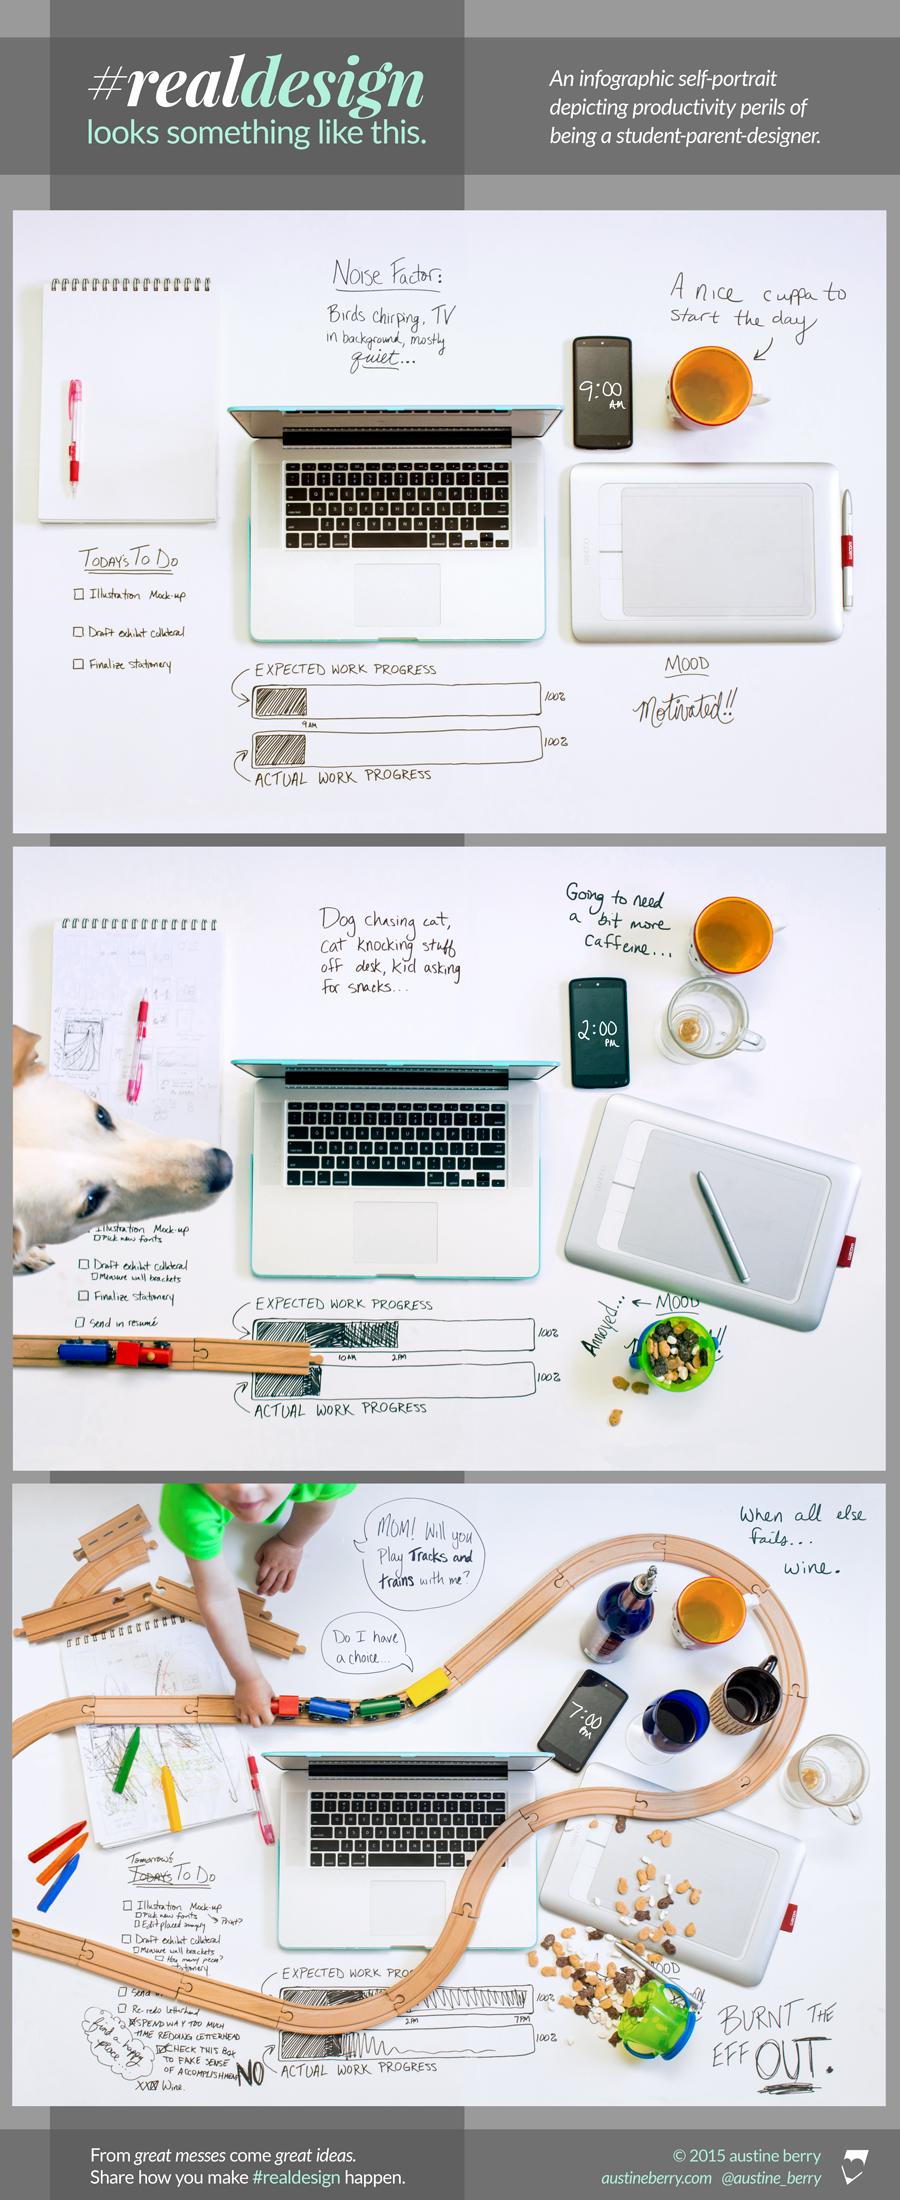 portrait-infographic-austineberry